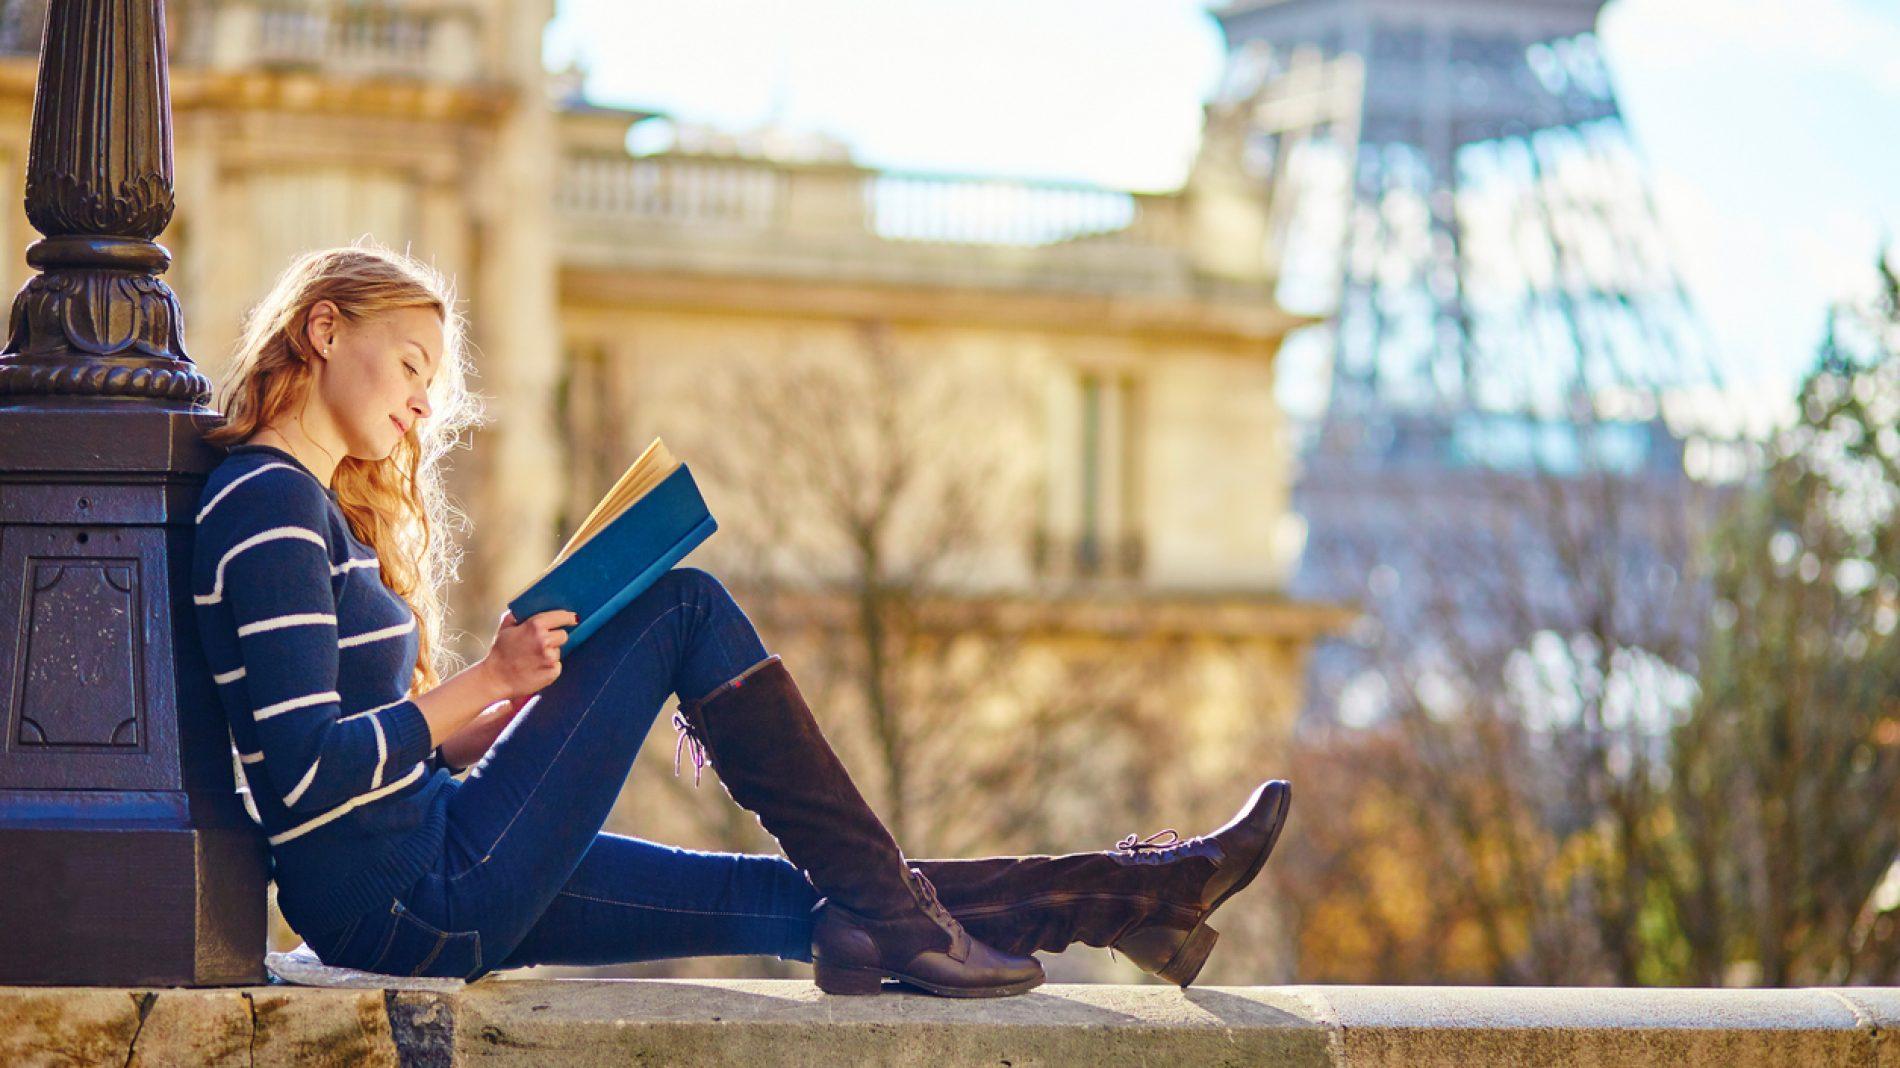 Beautiful woman in Paris, reading a book